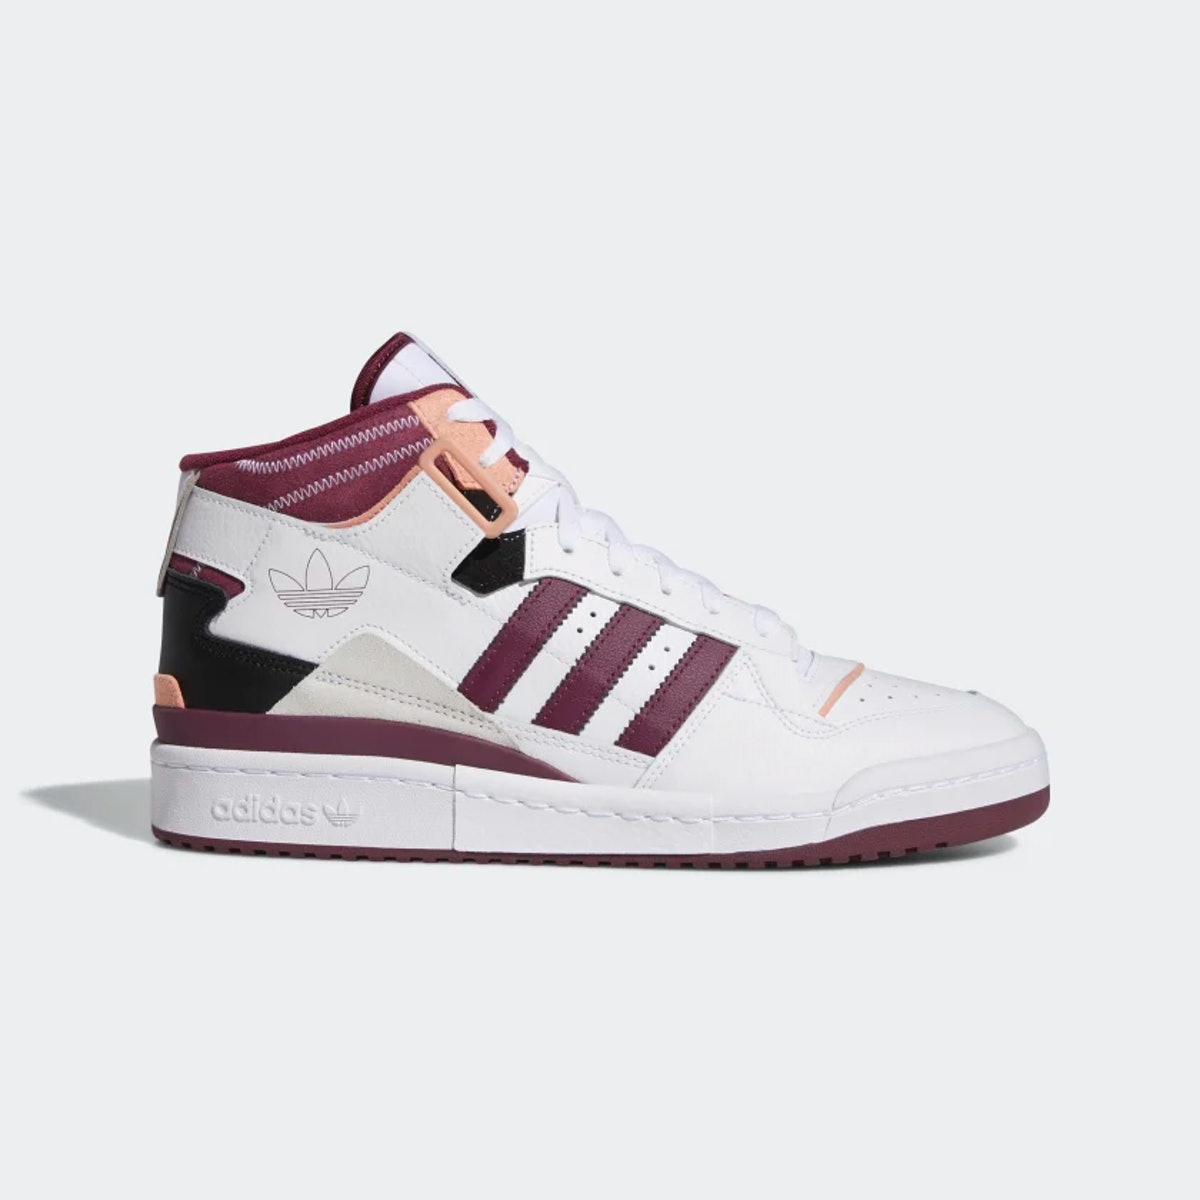 Adidas Forum Exhibit Mid Shoes